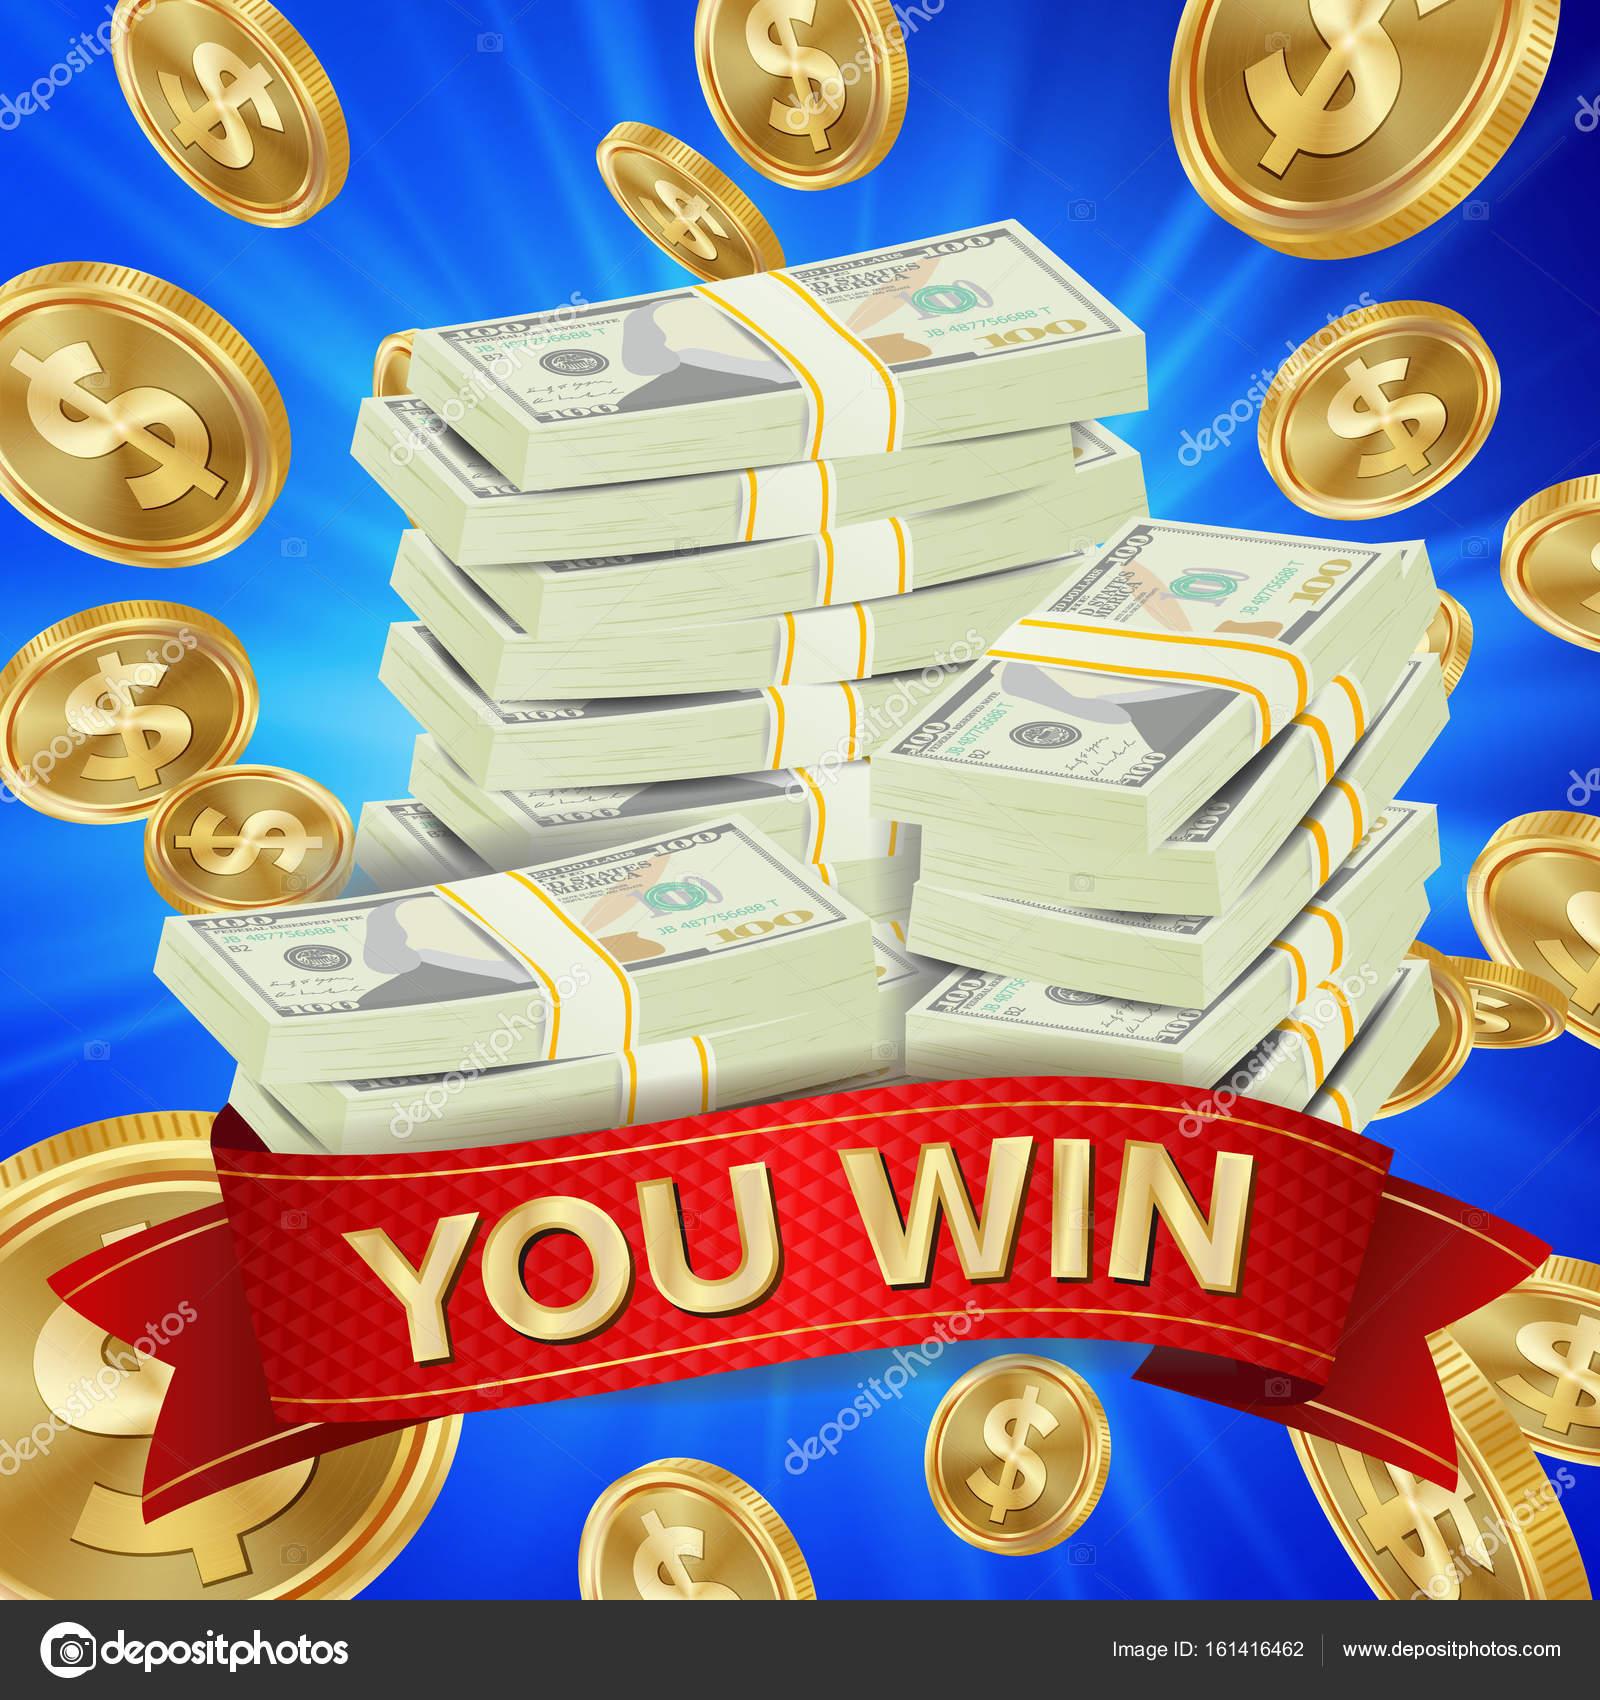 Onlinecasino casinomobile wincash keywords casino philladelphia mississippi